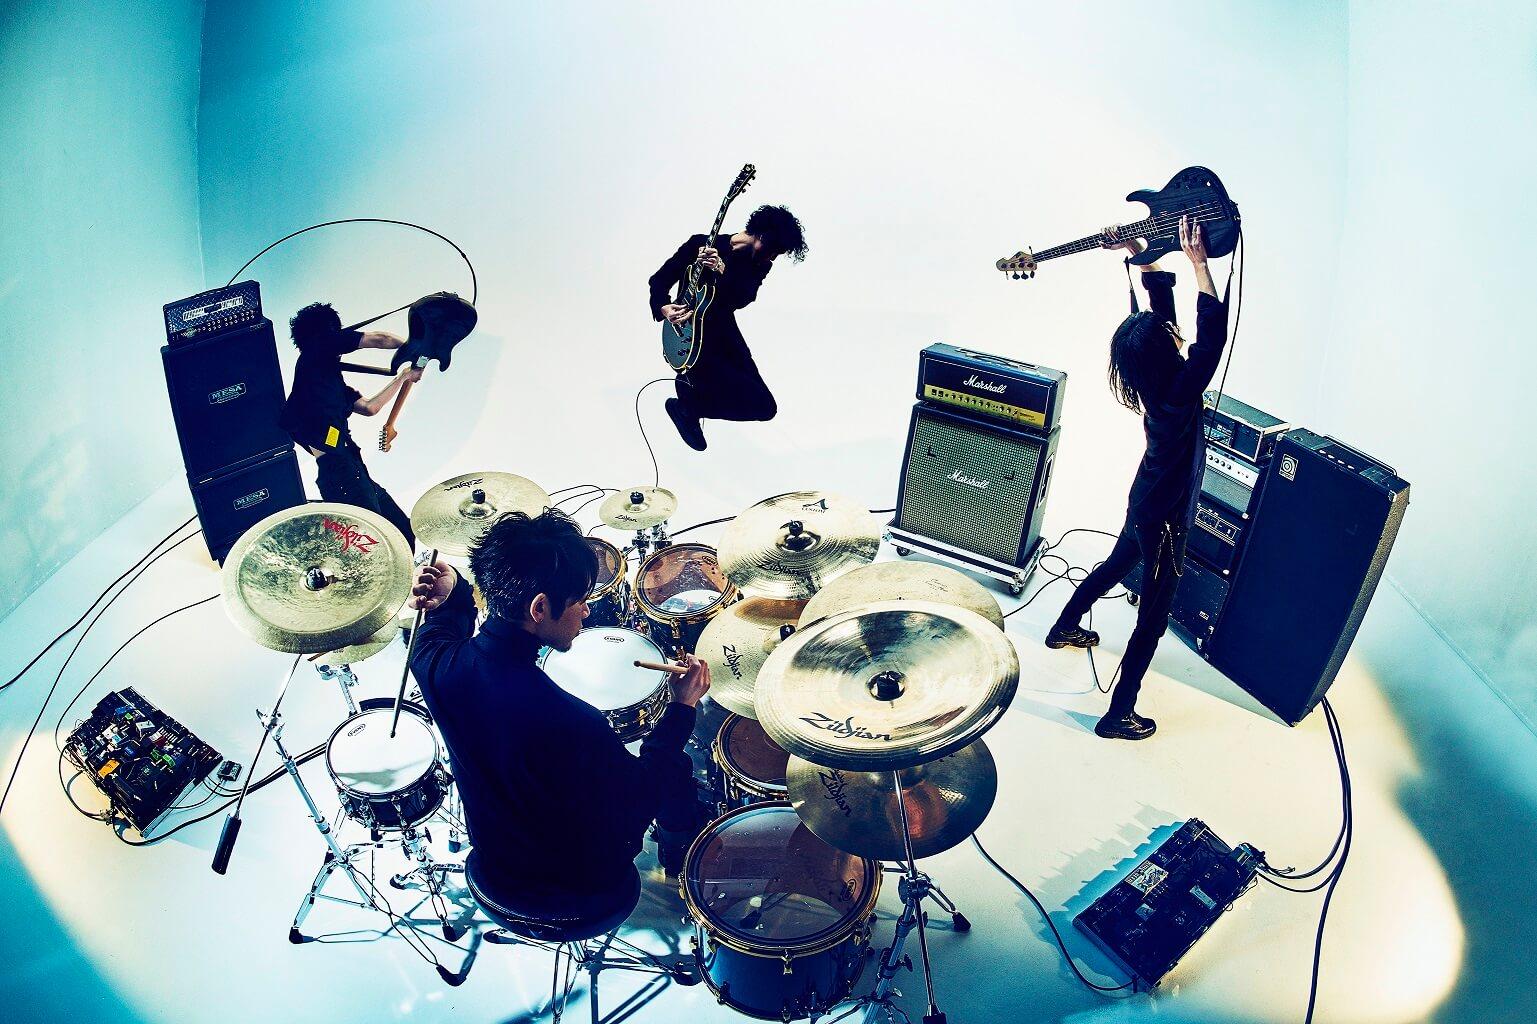 9mm Parabellum Bullet「名もなきヒーロー」ミュージックビデオ公開サムネイル画像